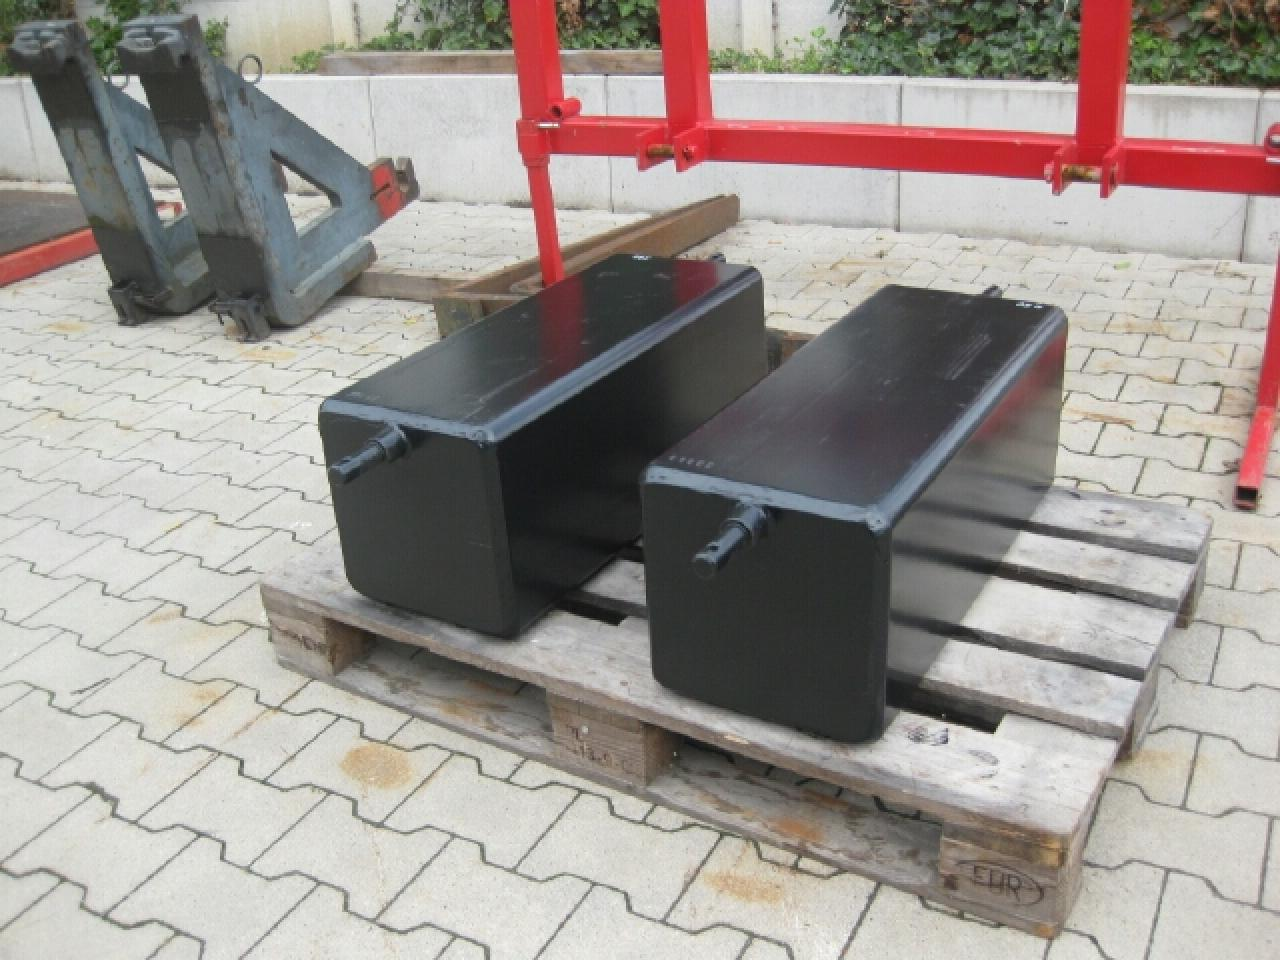 Case 480 kg